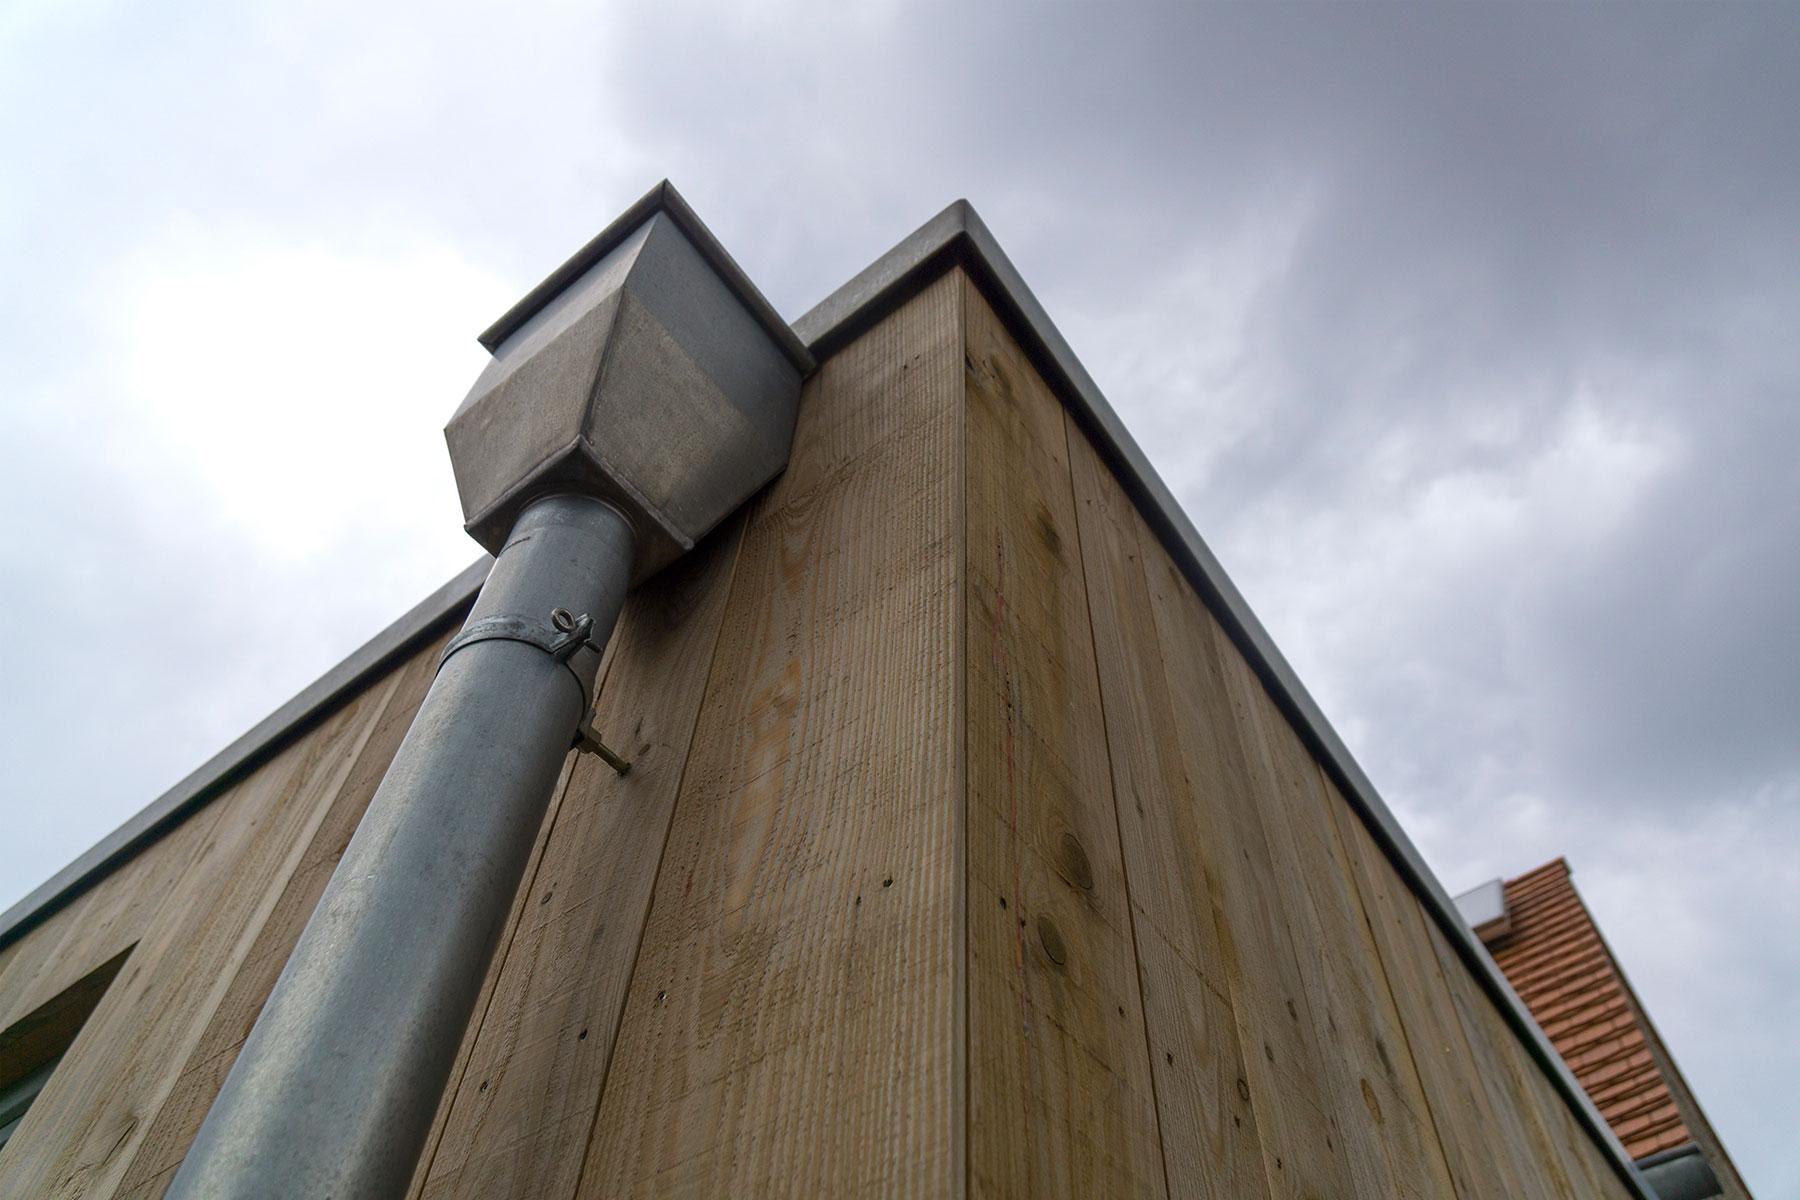 Holzrahmenbau Wasserfangkasten